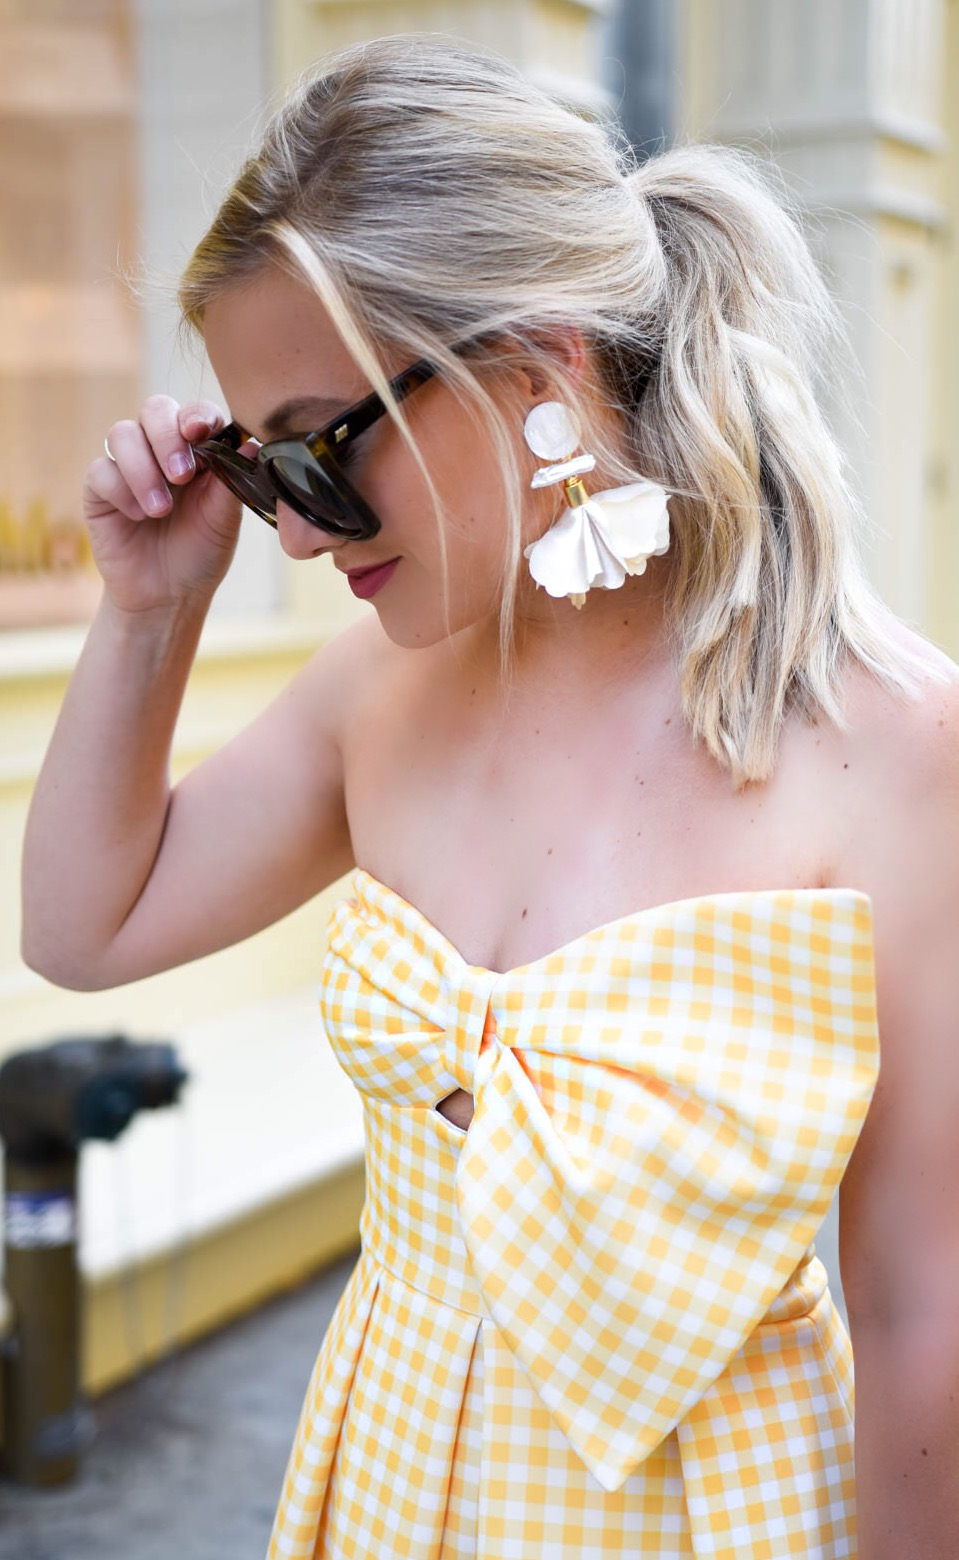 Yellow-Gingham-Dress, Yellow-Bow-Dress, basket-bag, nicola-bathie-earrings